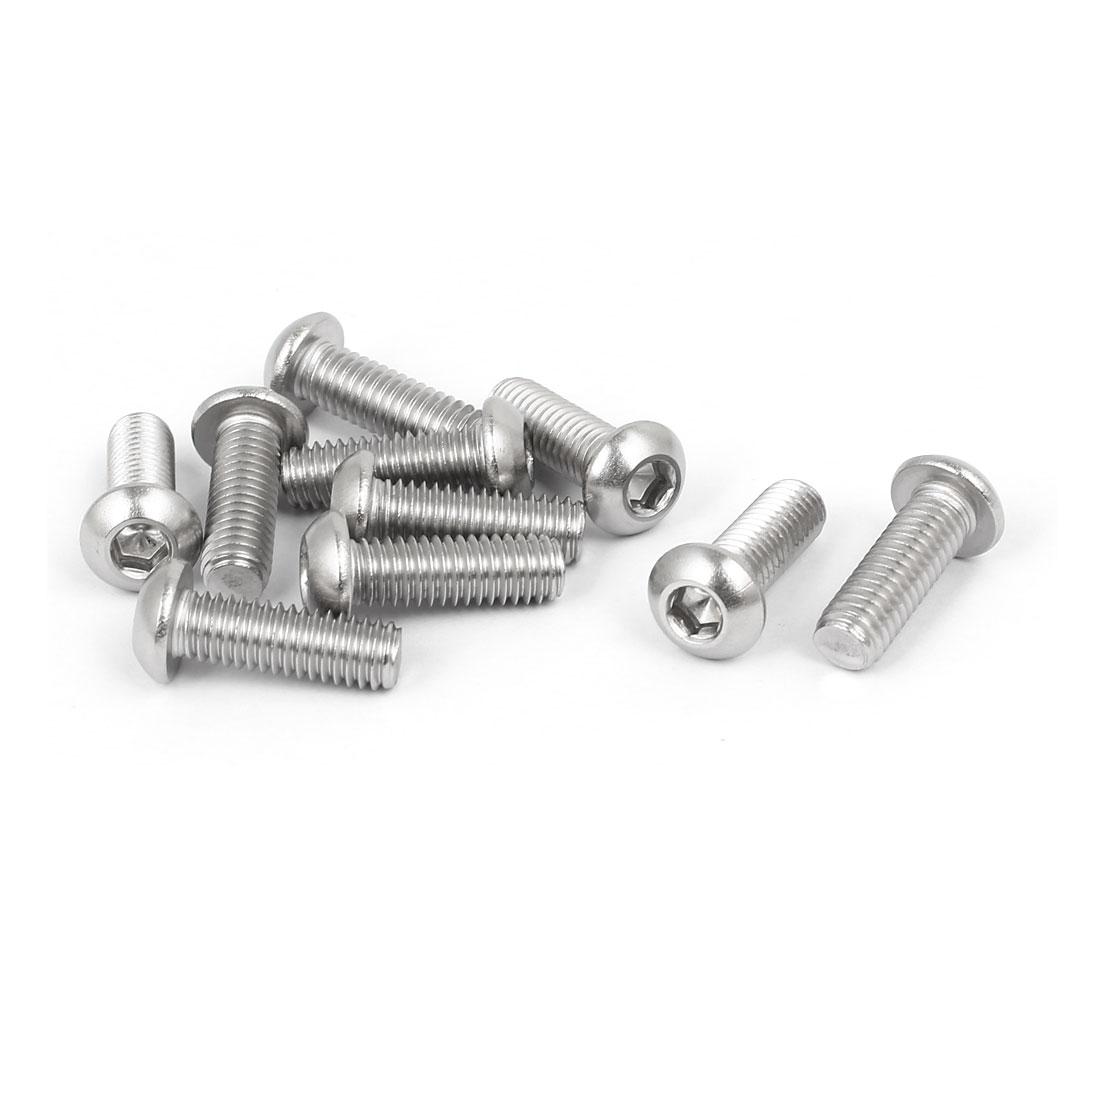 M6x18mm 316 Stainless Steel Button Head Hex Socket Cap Screw Bolt Fastener 10pcs